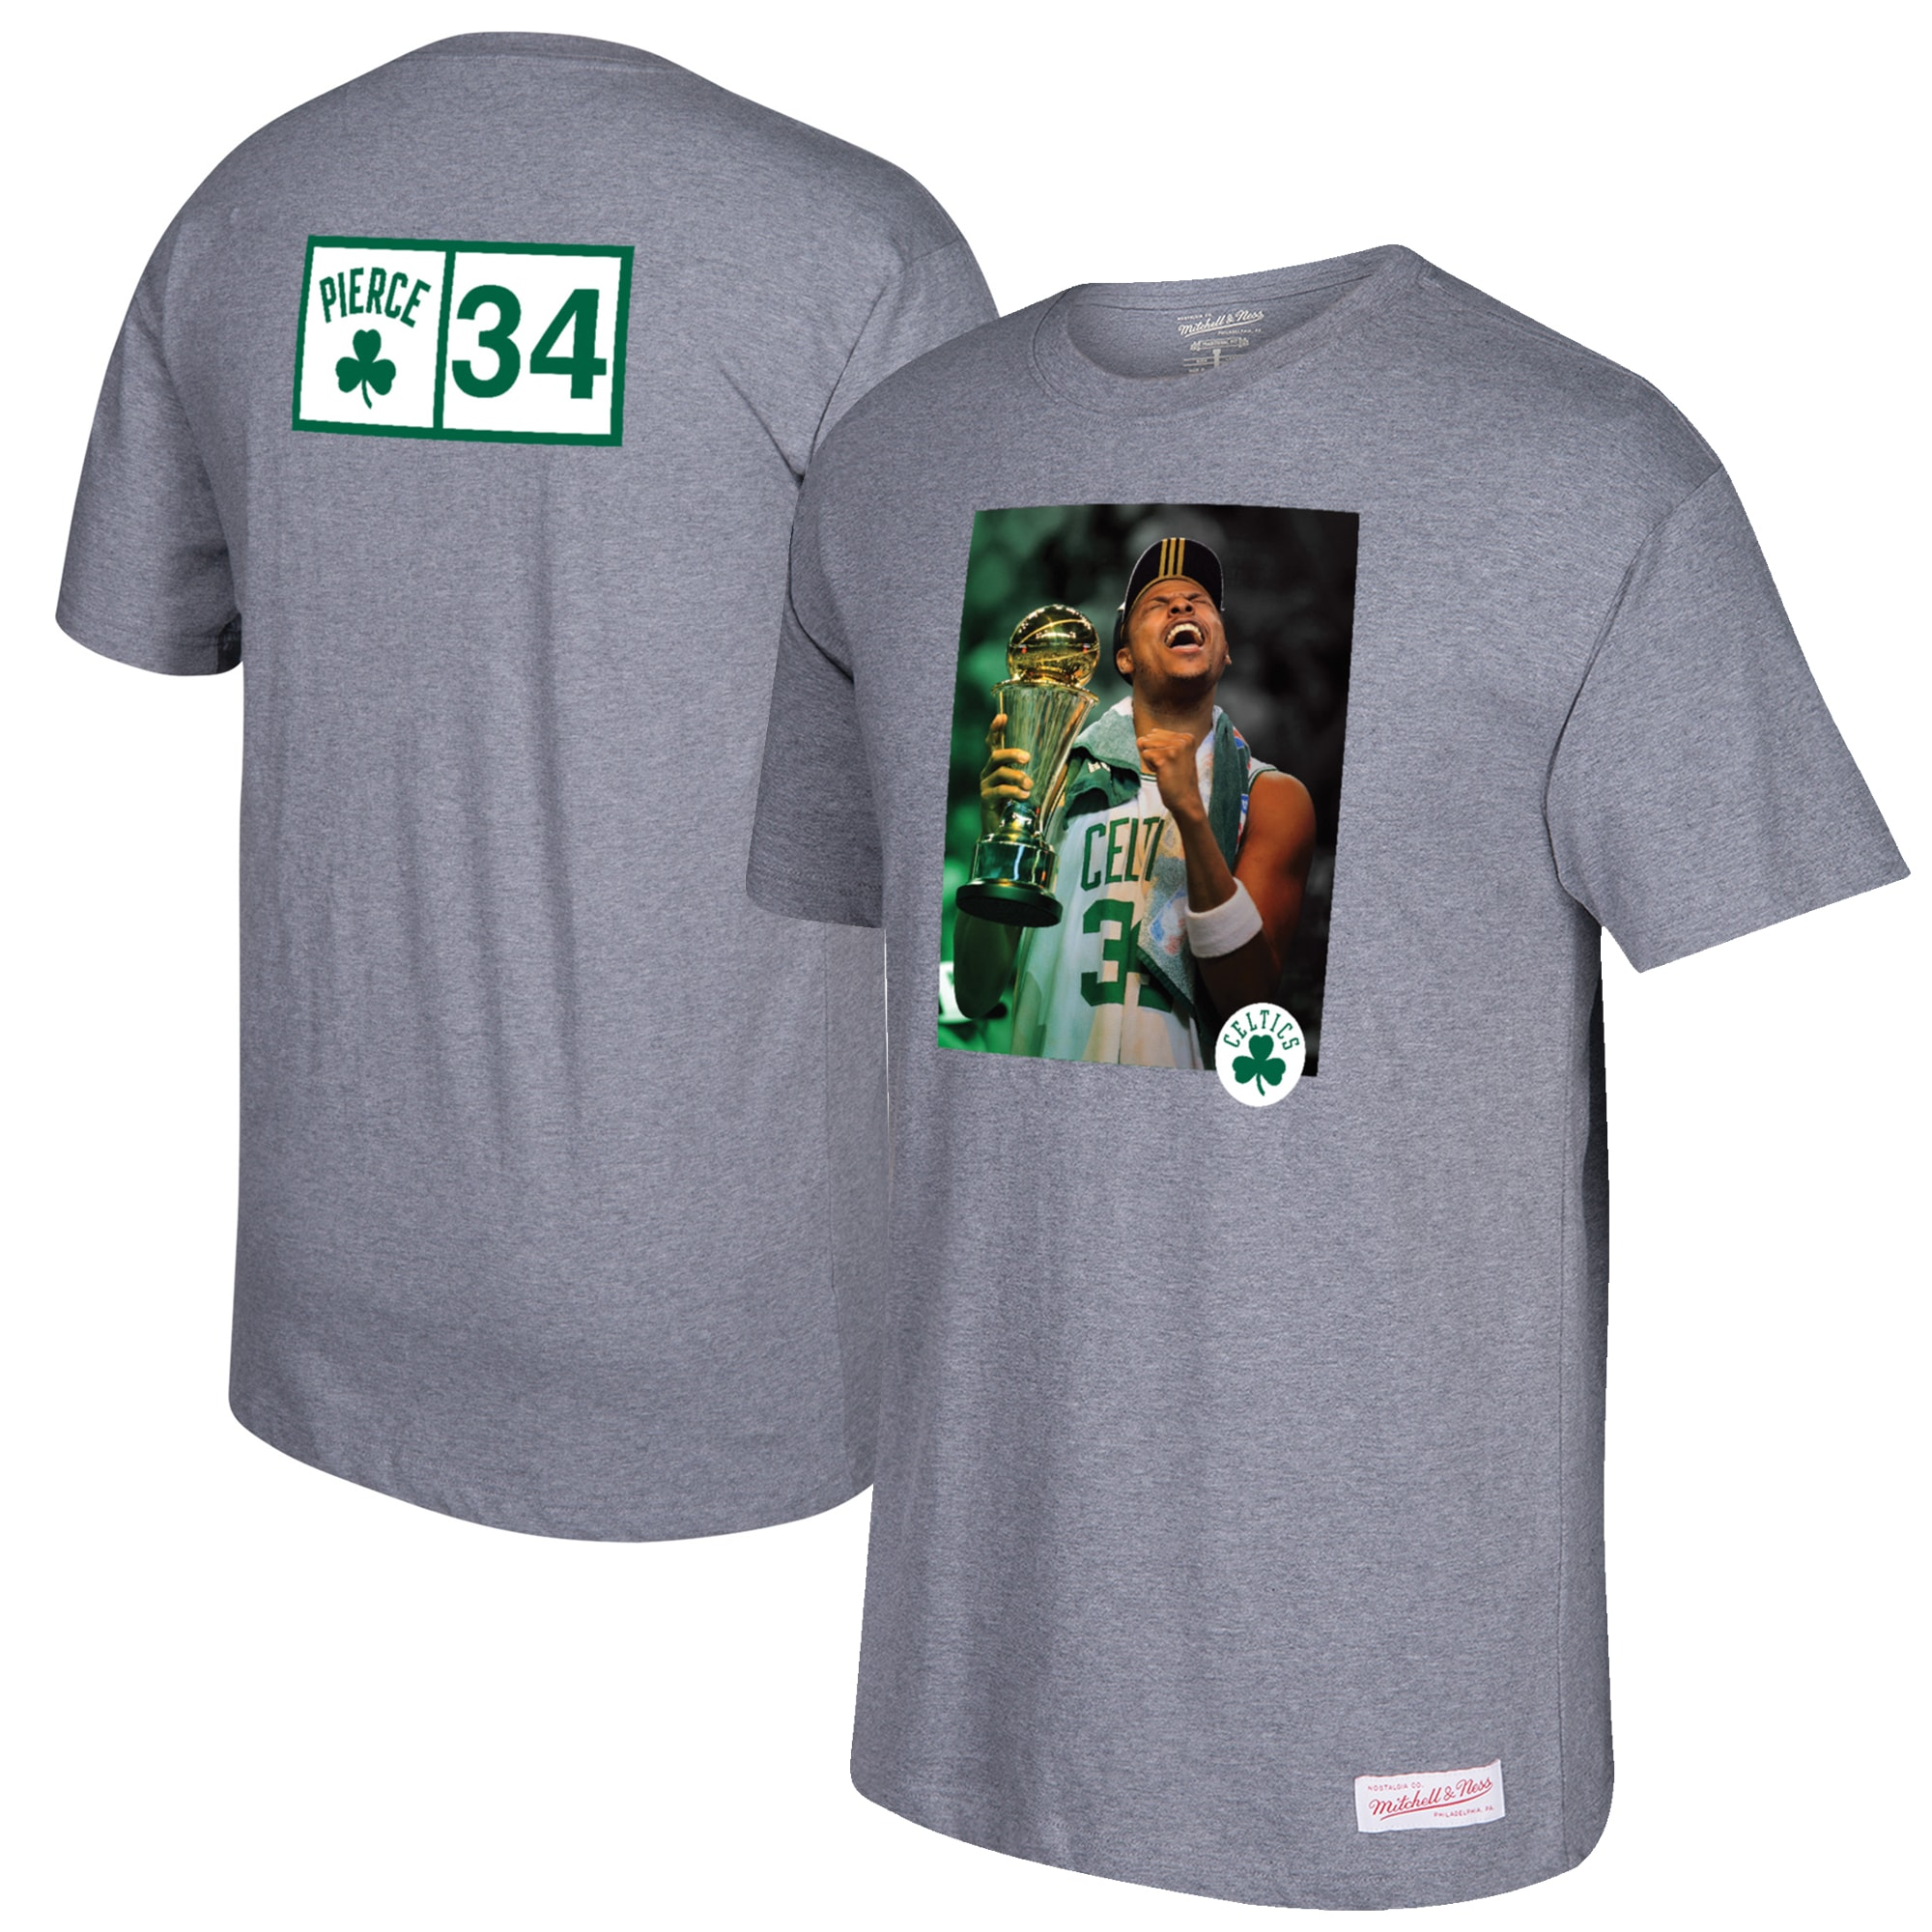 Paul Pierce Boston Celtics Mitchell & Ness Graphic T-Shirt - Gray